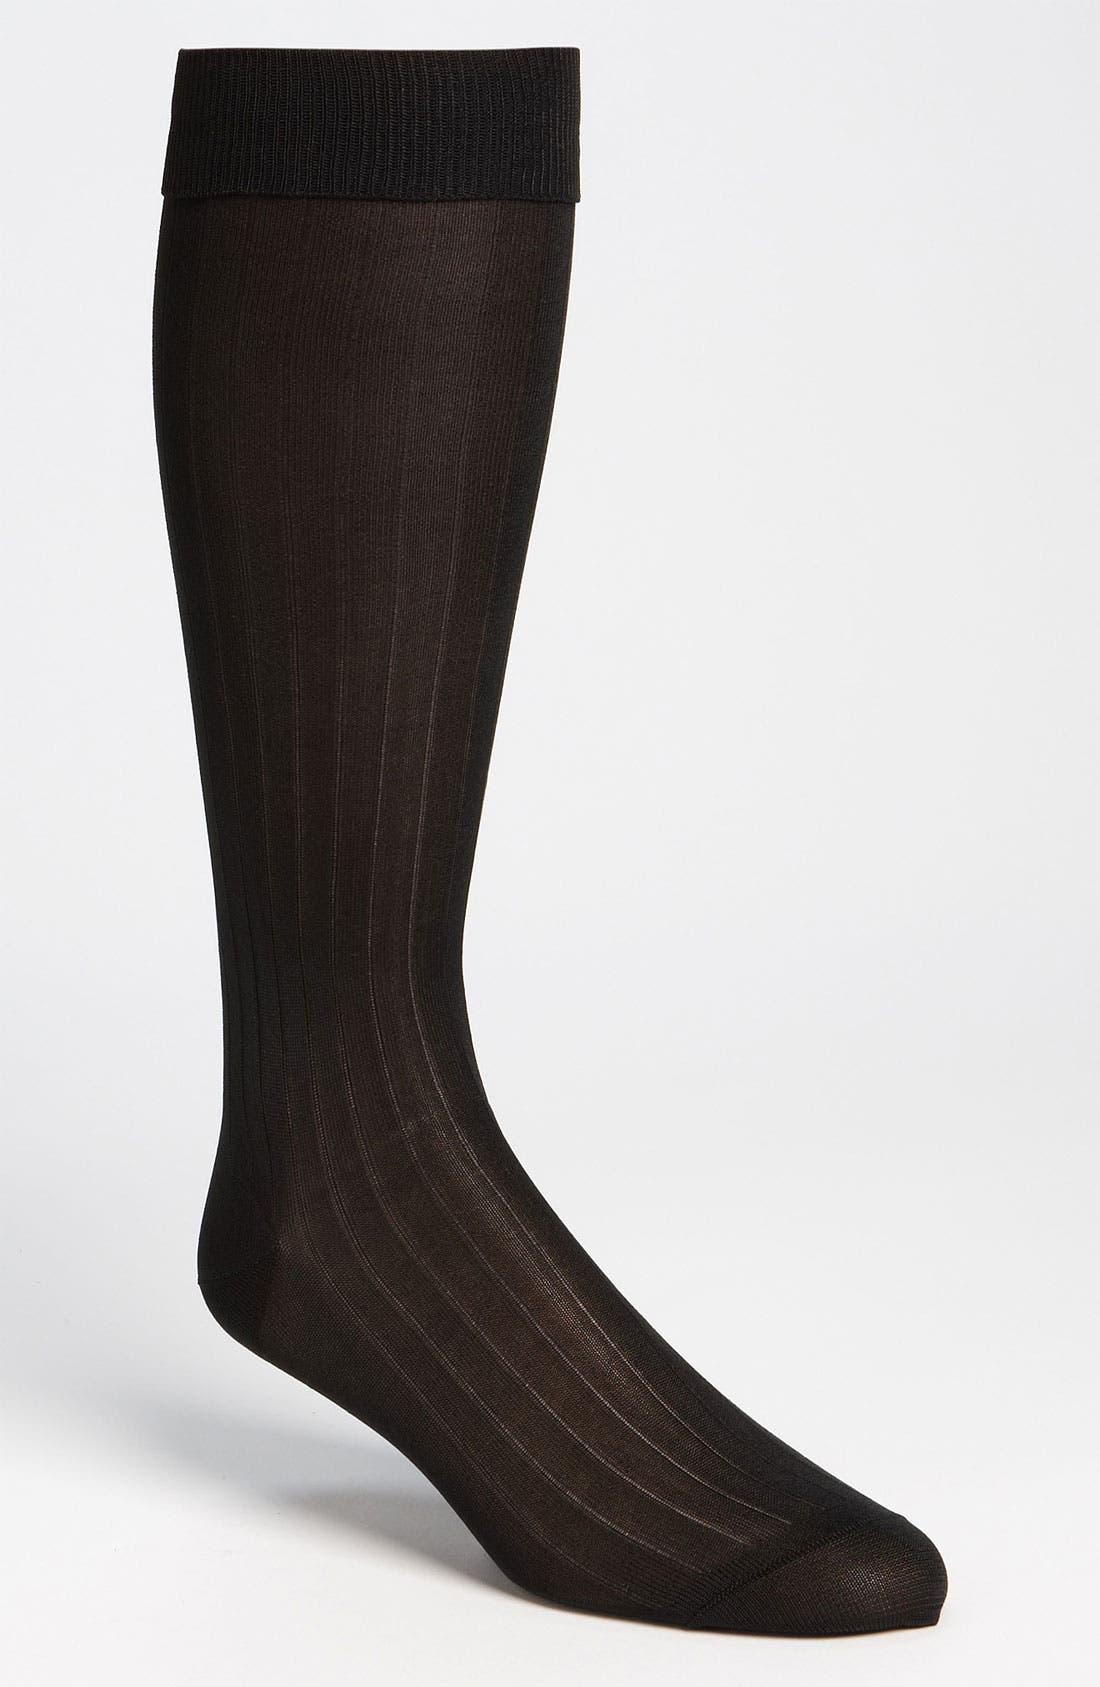 Alternate Image 1 Selected - Pantherella Silk Ribbed Formal Socks (Online Only)